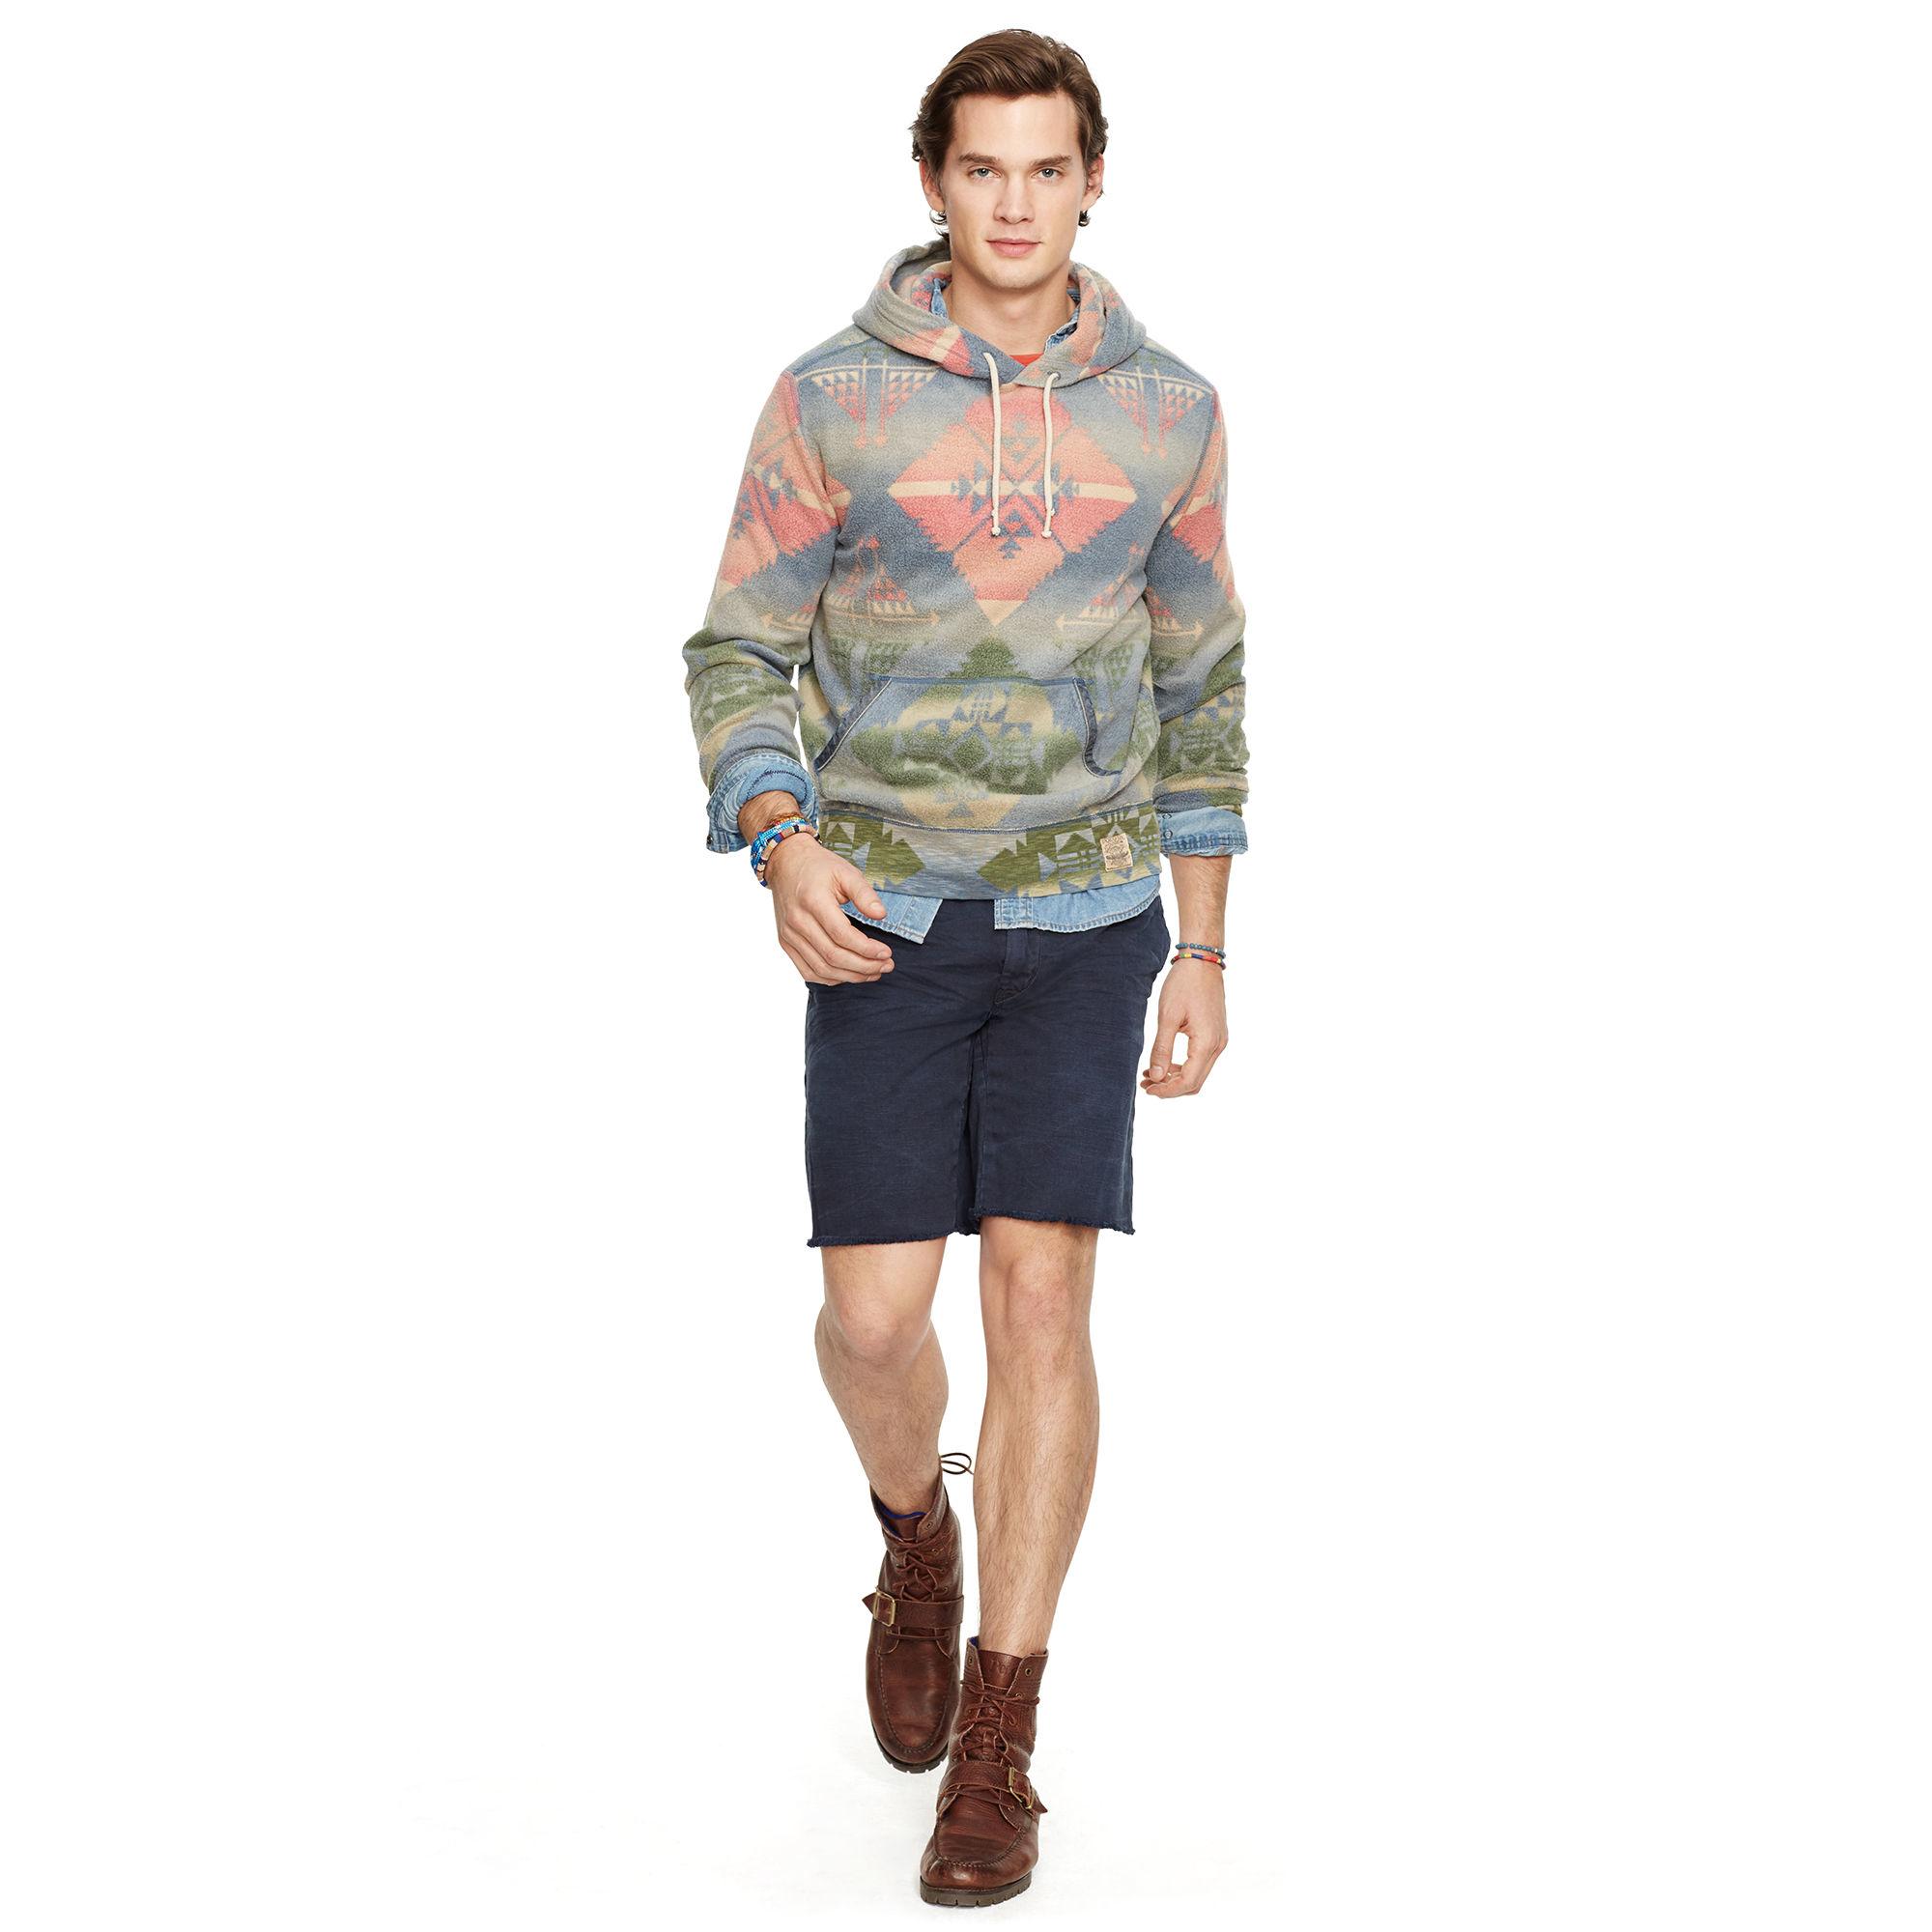 b05b5d403 Polo Ralph Lauren Southwestern Fleece Hoodie for Men - Lyst